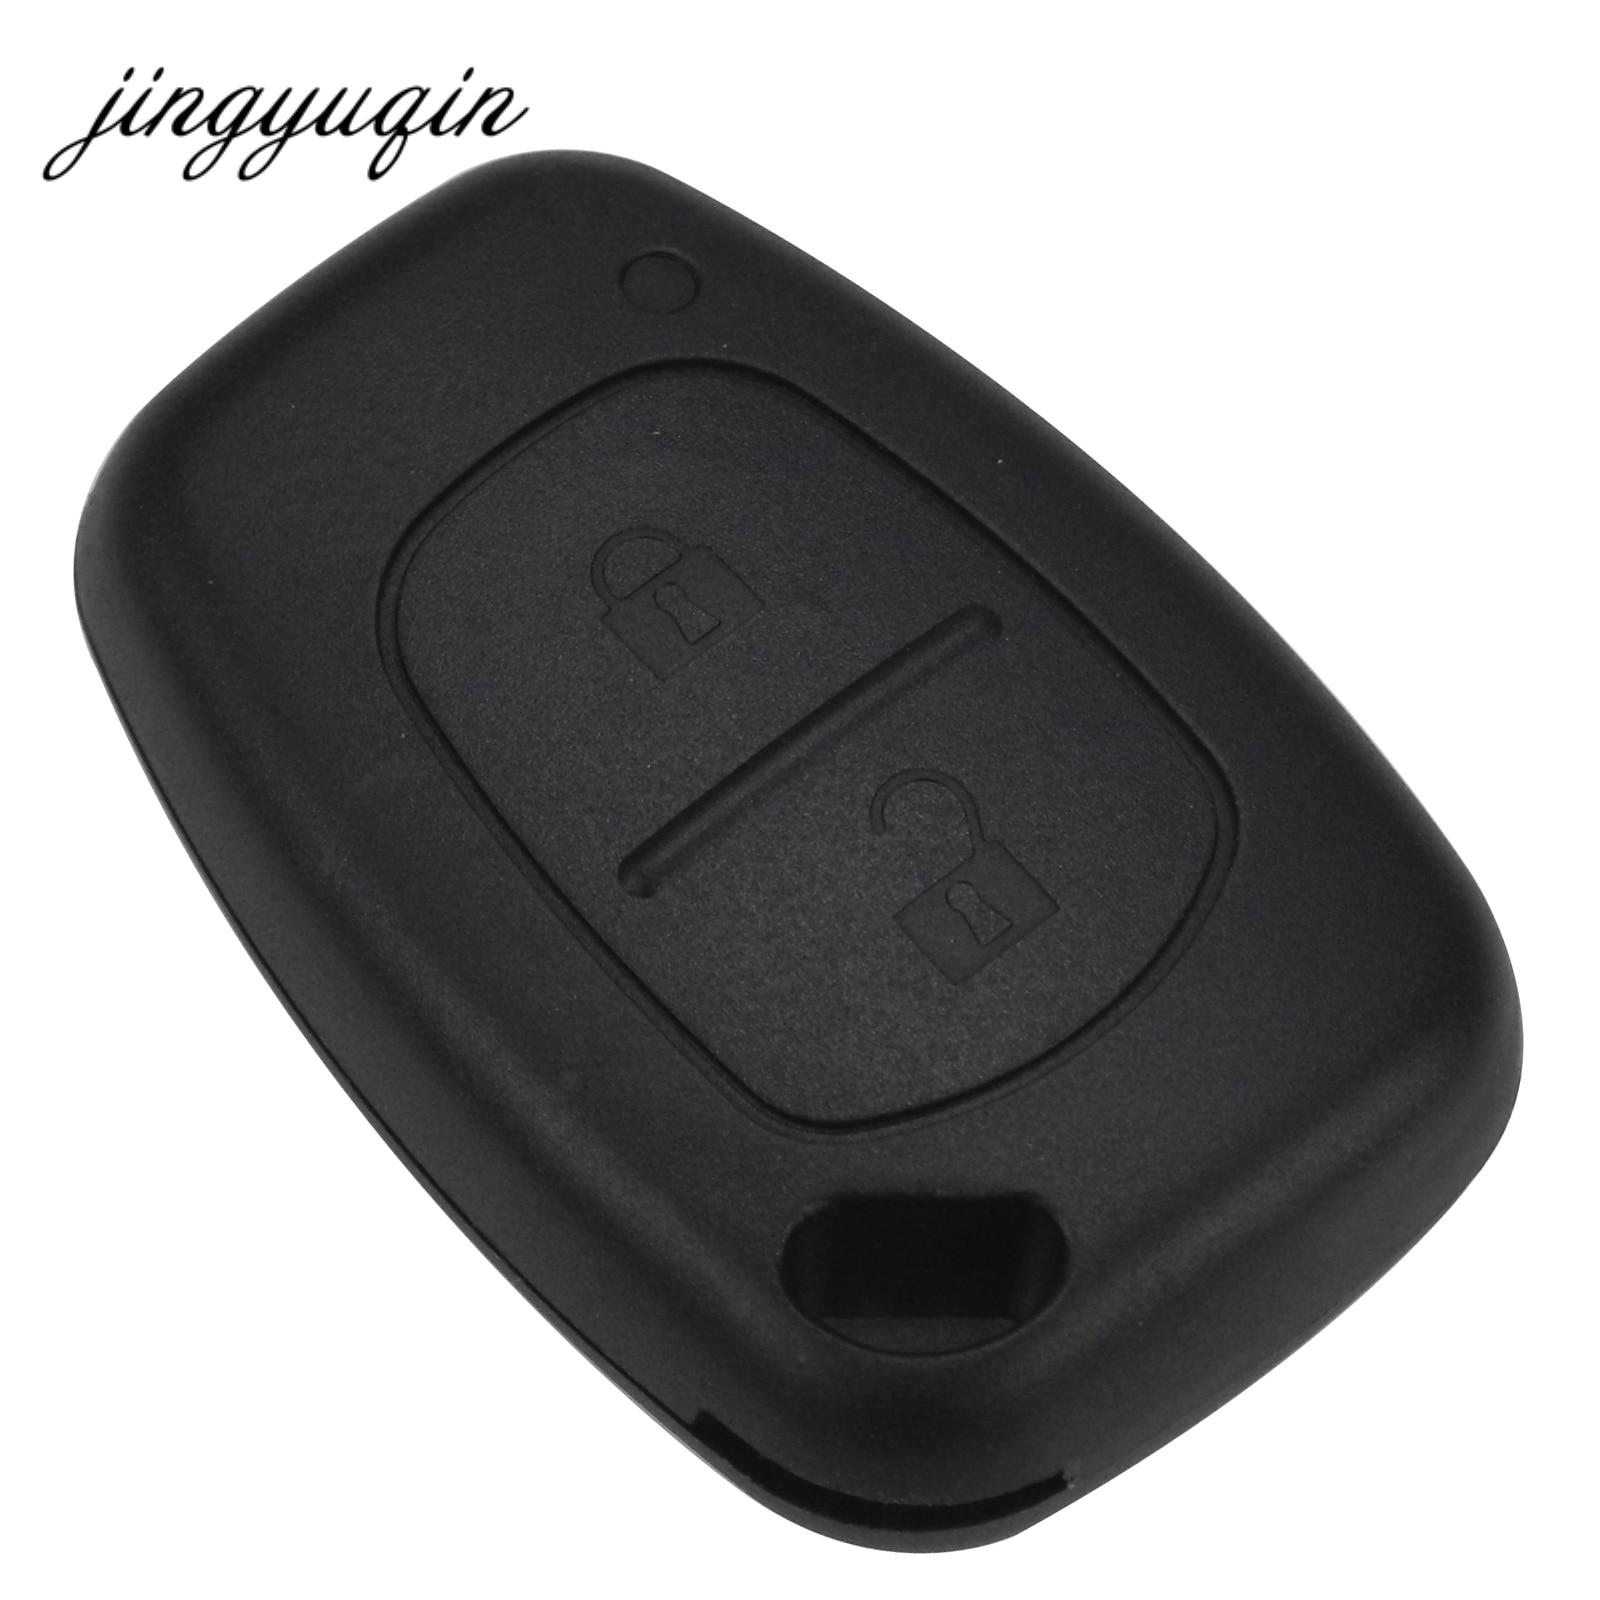 jingyuqin 2 Button Remote Car Key Shell for Renault Trafic Vauxhall Opel Vivaro Nissan Primastar Fob Case цены онлайн